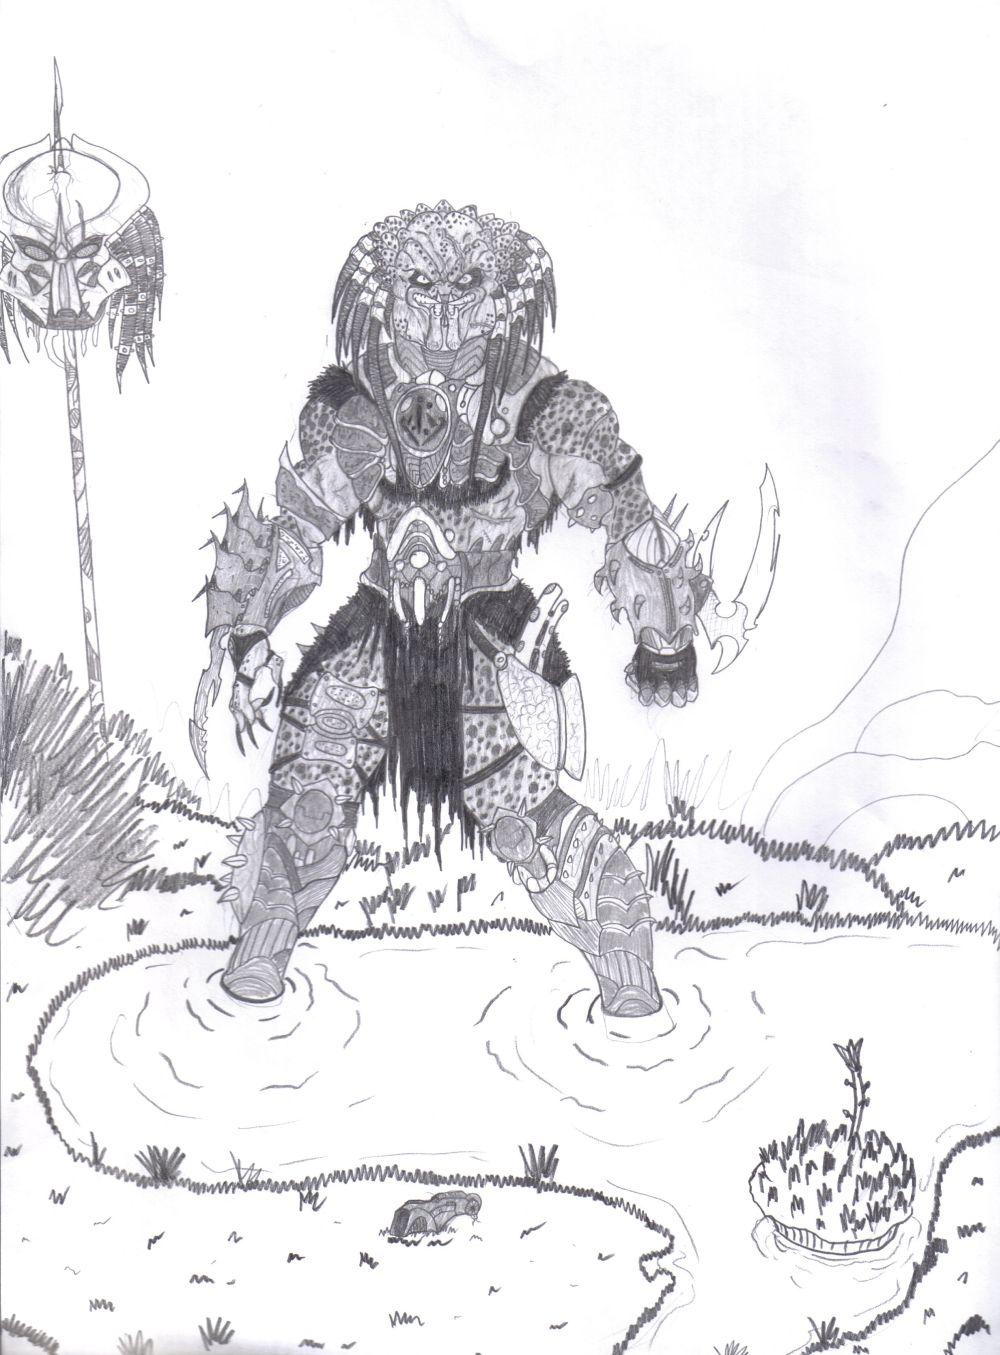 Bad Blood Predator by Bender18 on DeviantArt